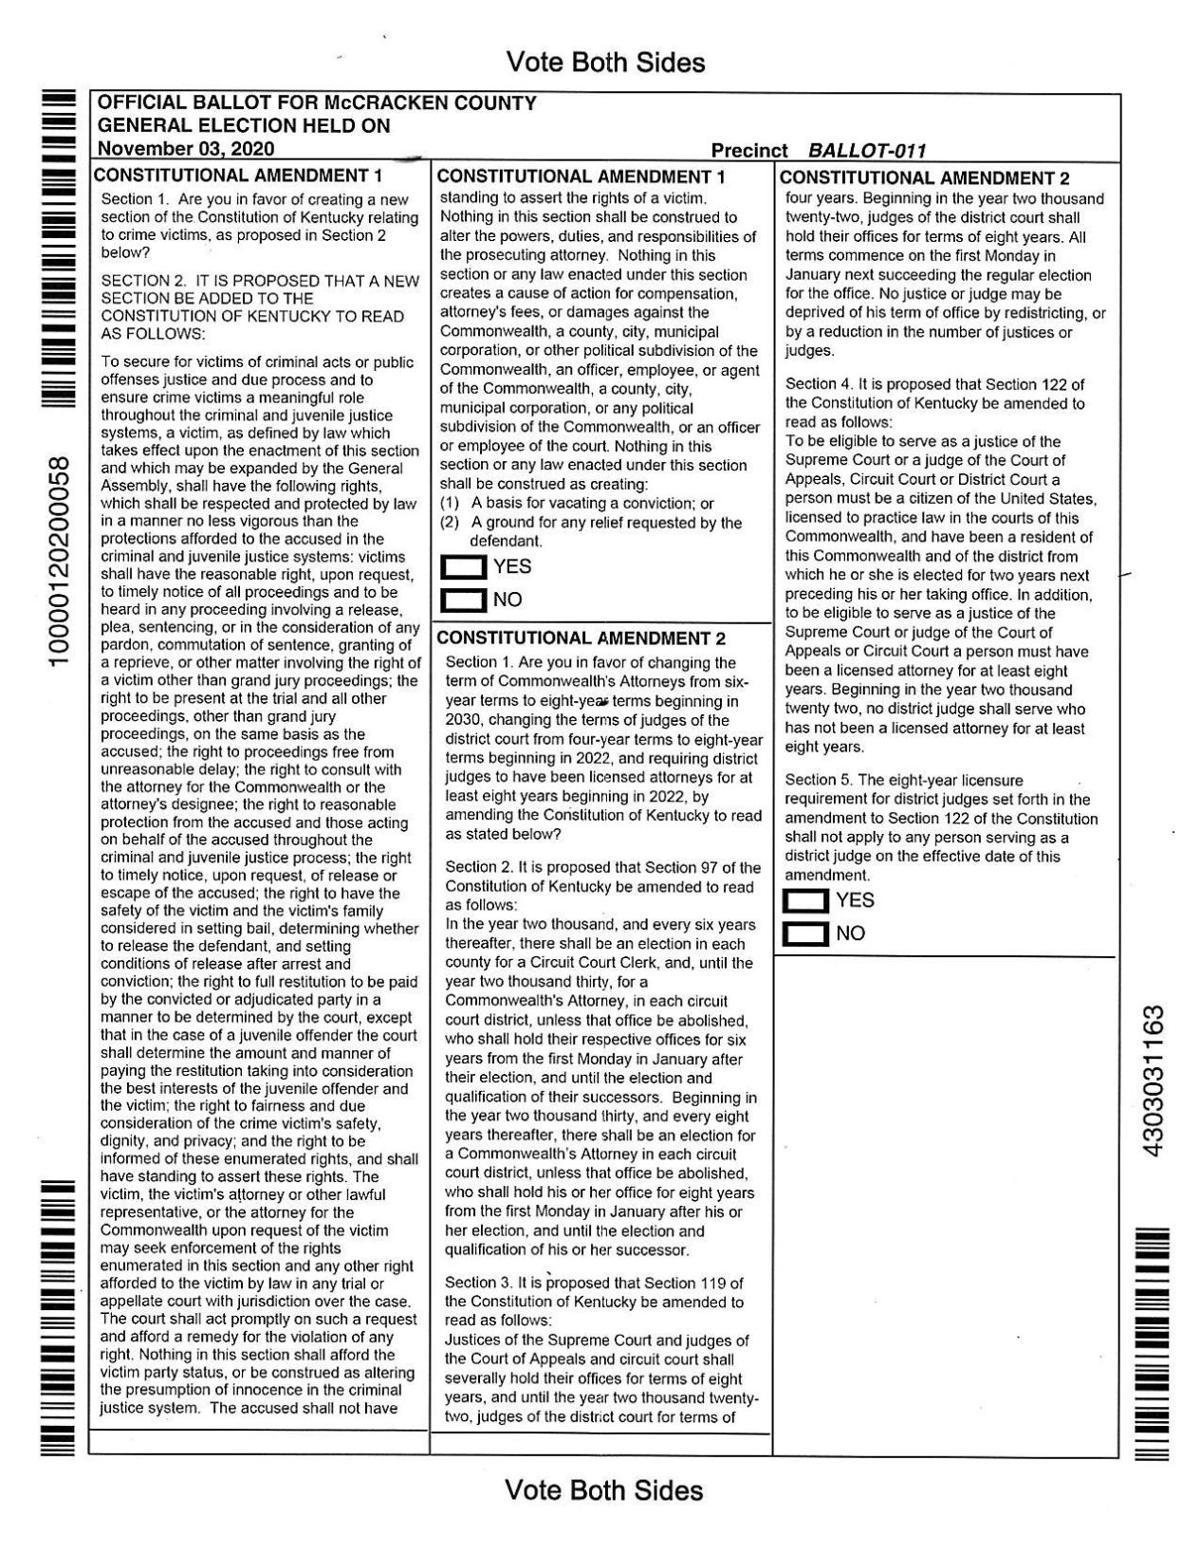 Copy of Constitutional Amendment